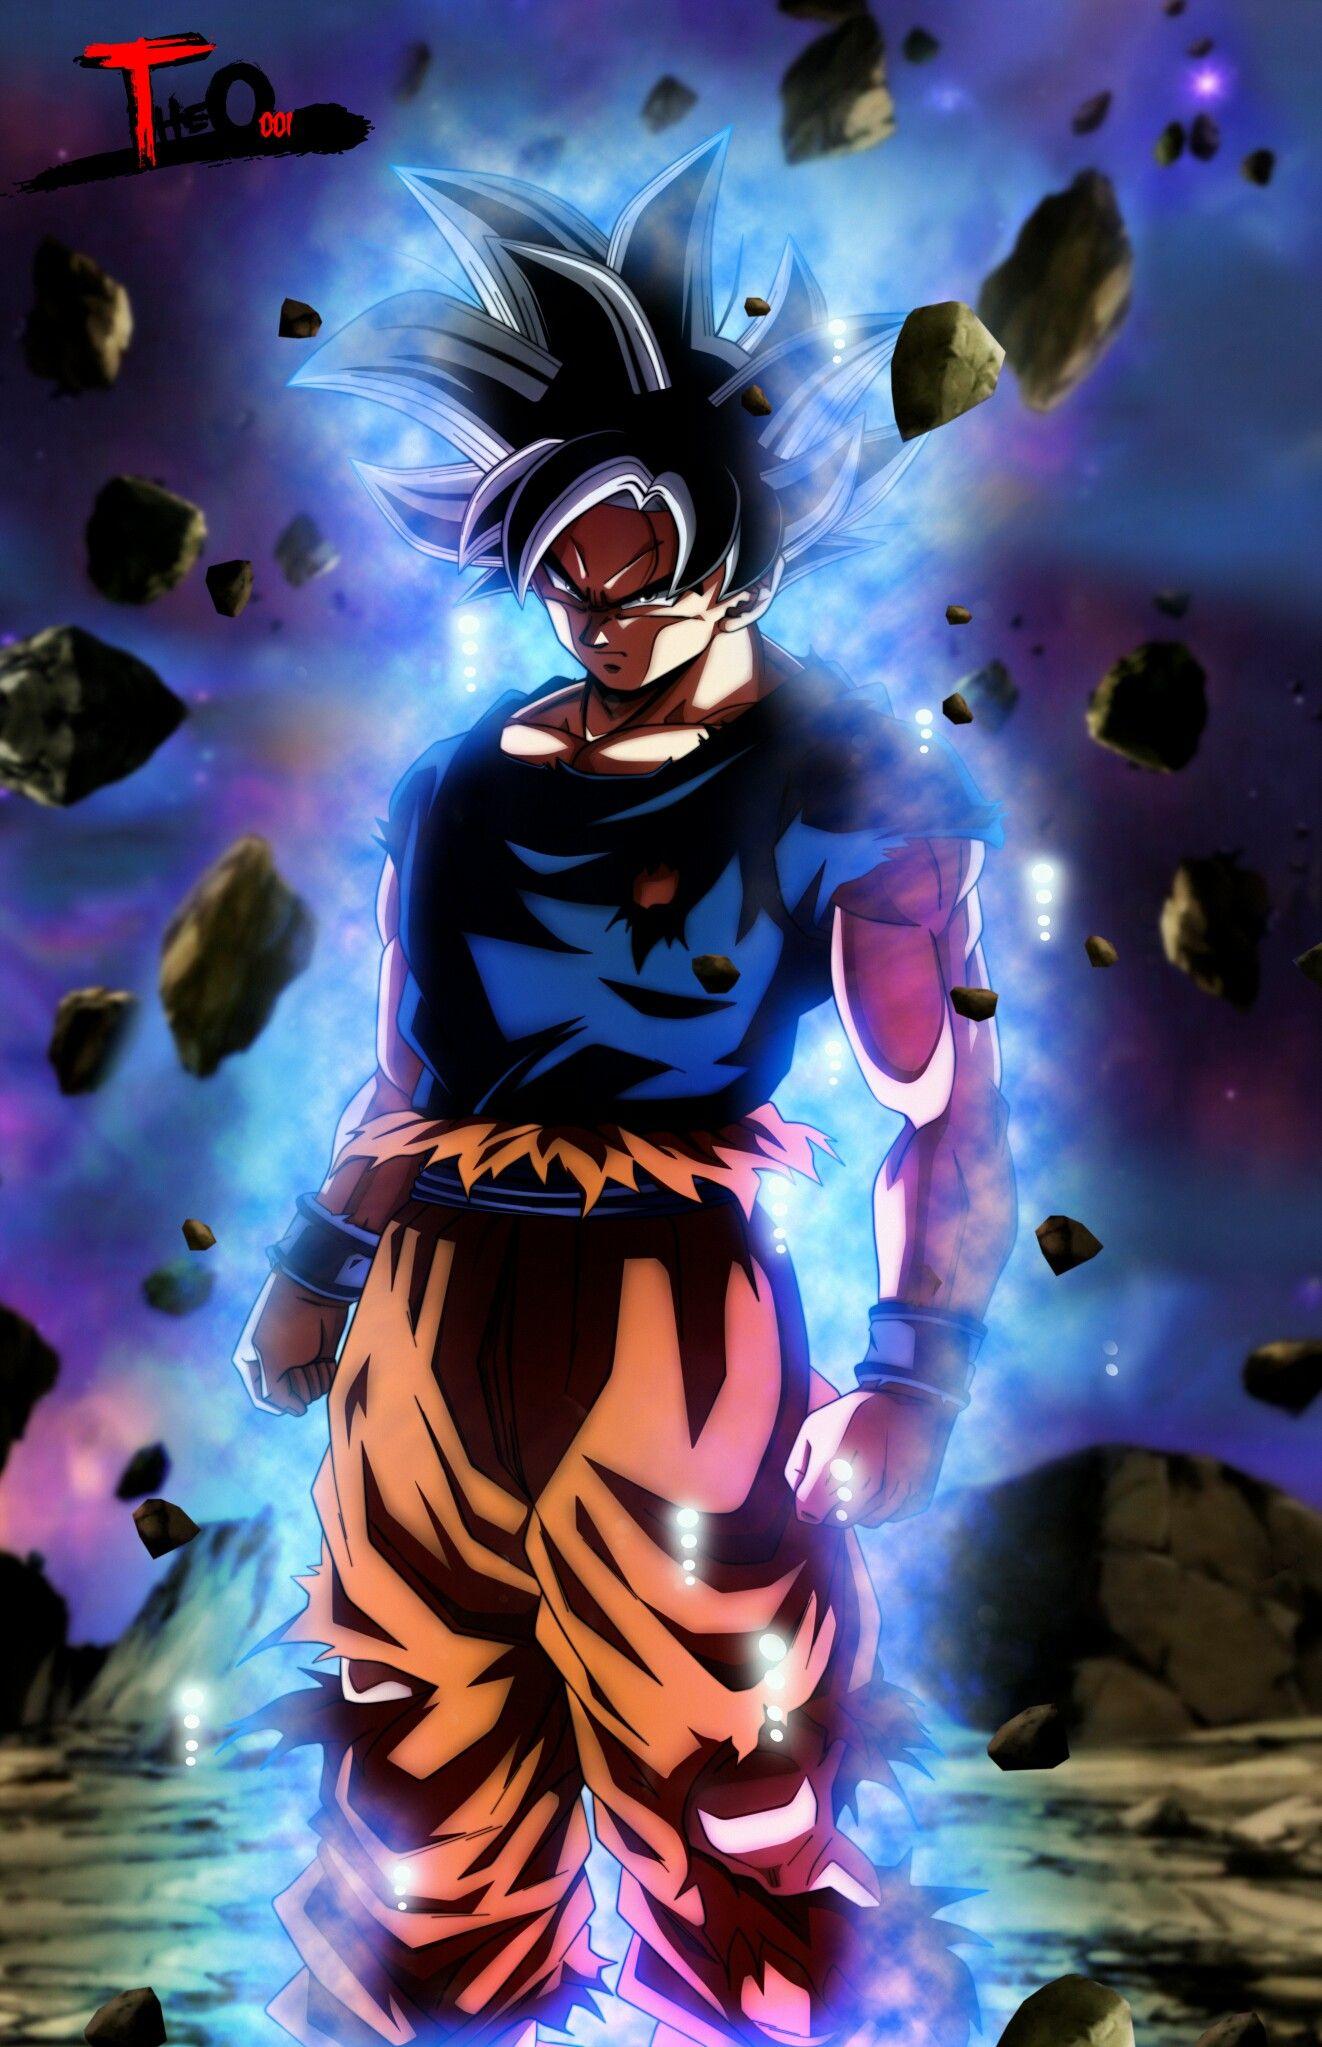 Goku Ultra Instinct Iphone X Live Wallpaper | Iphone Wallpaper